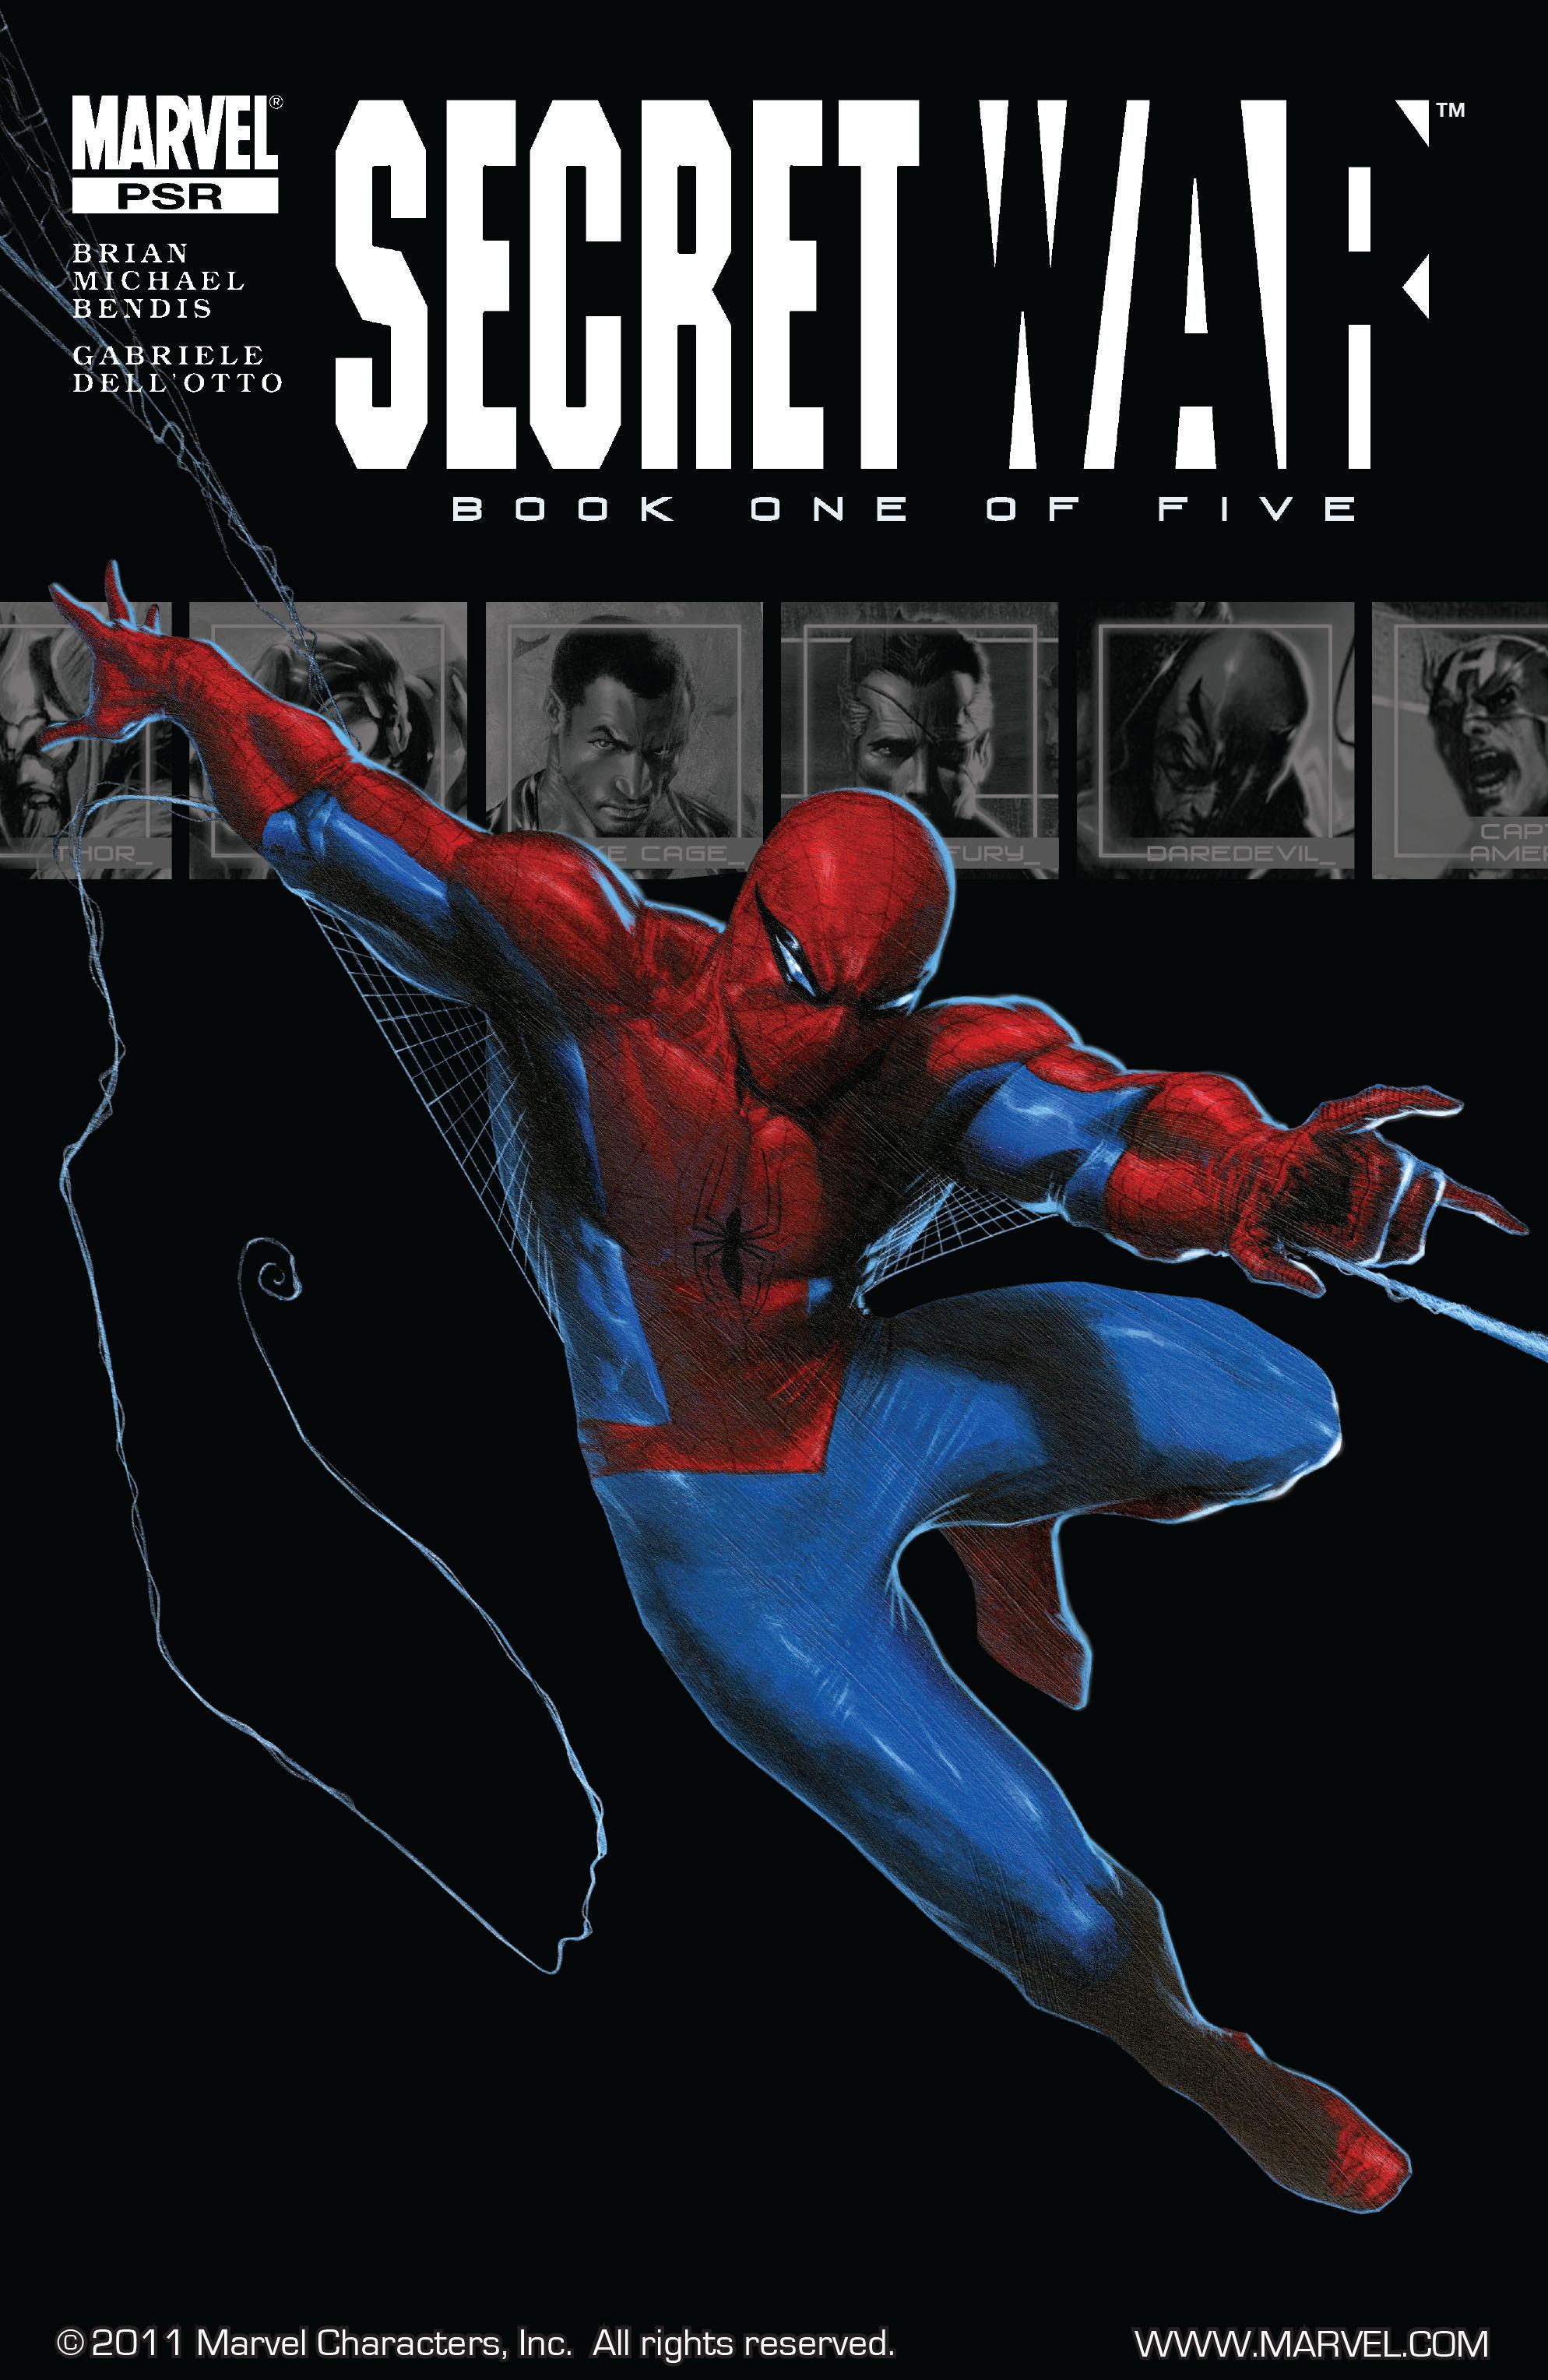 Read online Secret War comic -  Issue # Full - 3